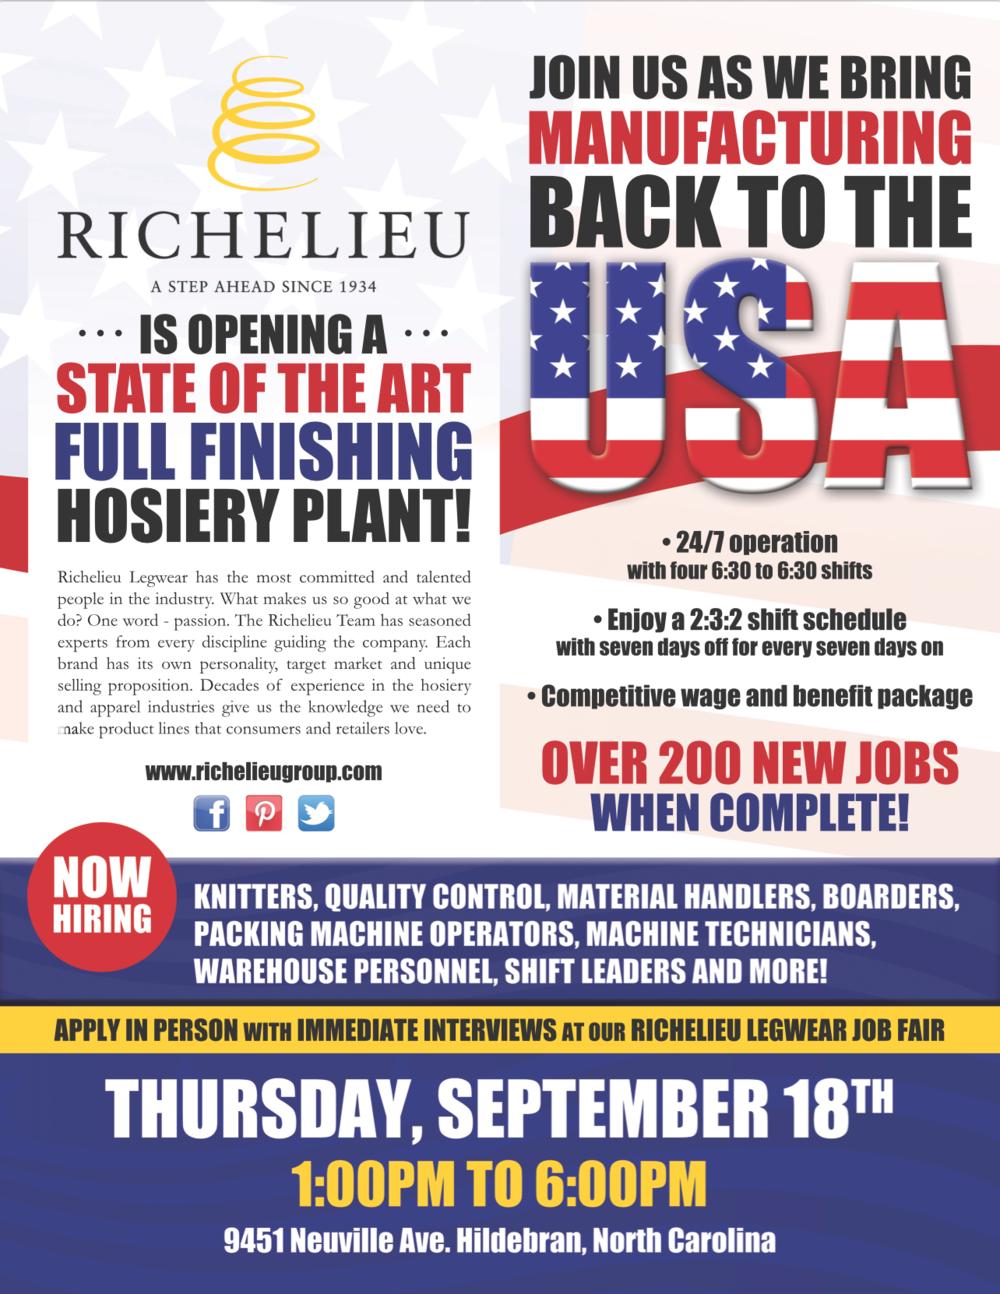 designs nicole ansalvish usa manufacturing job fair flyer